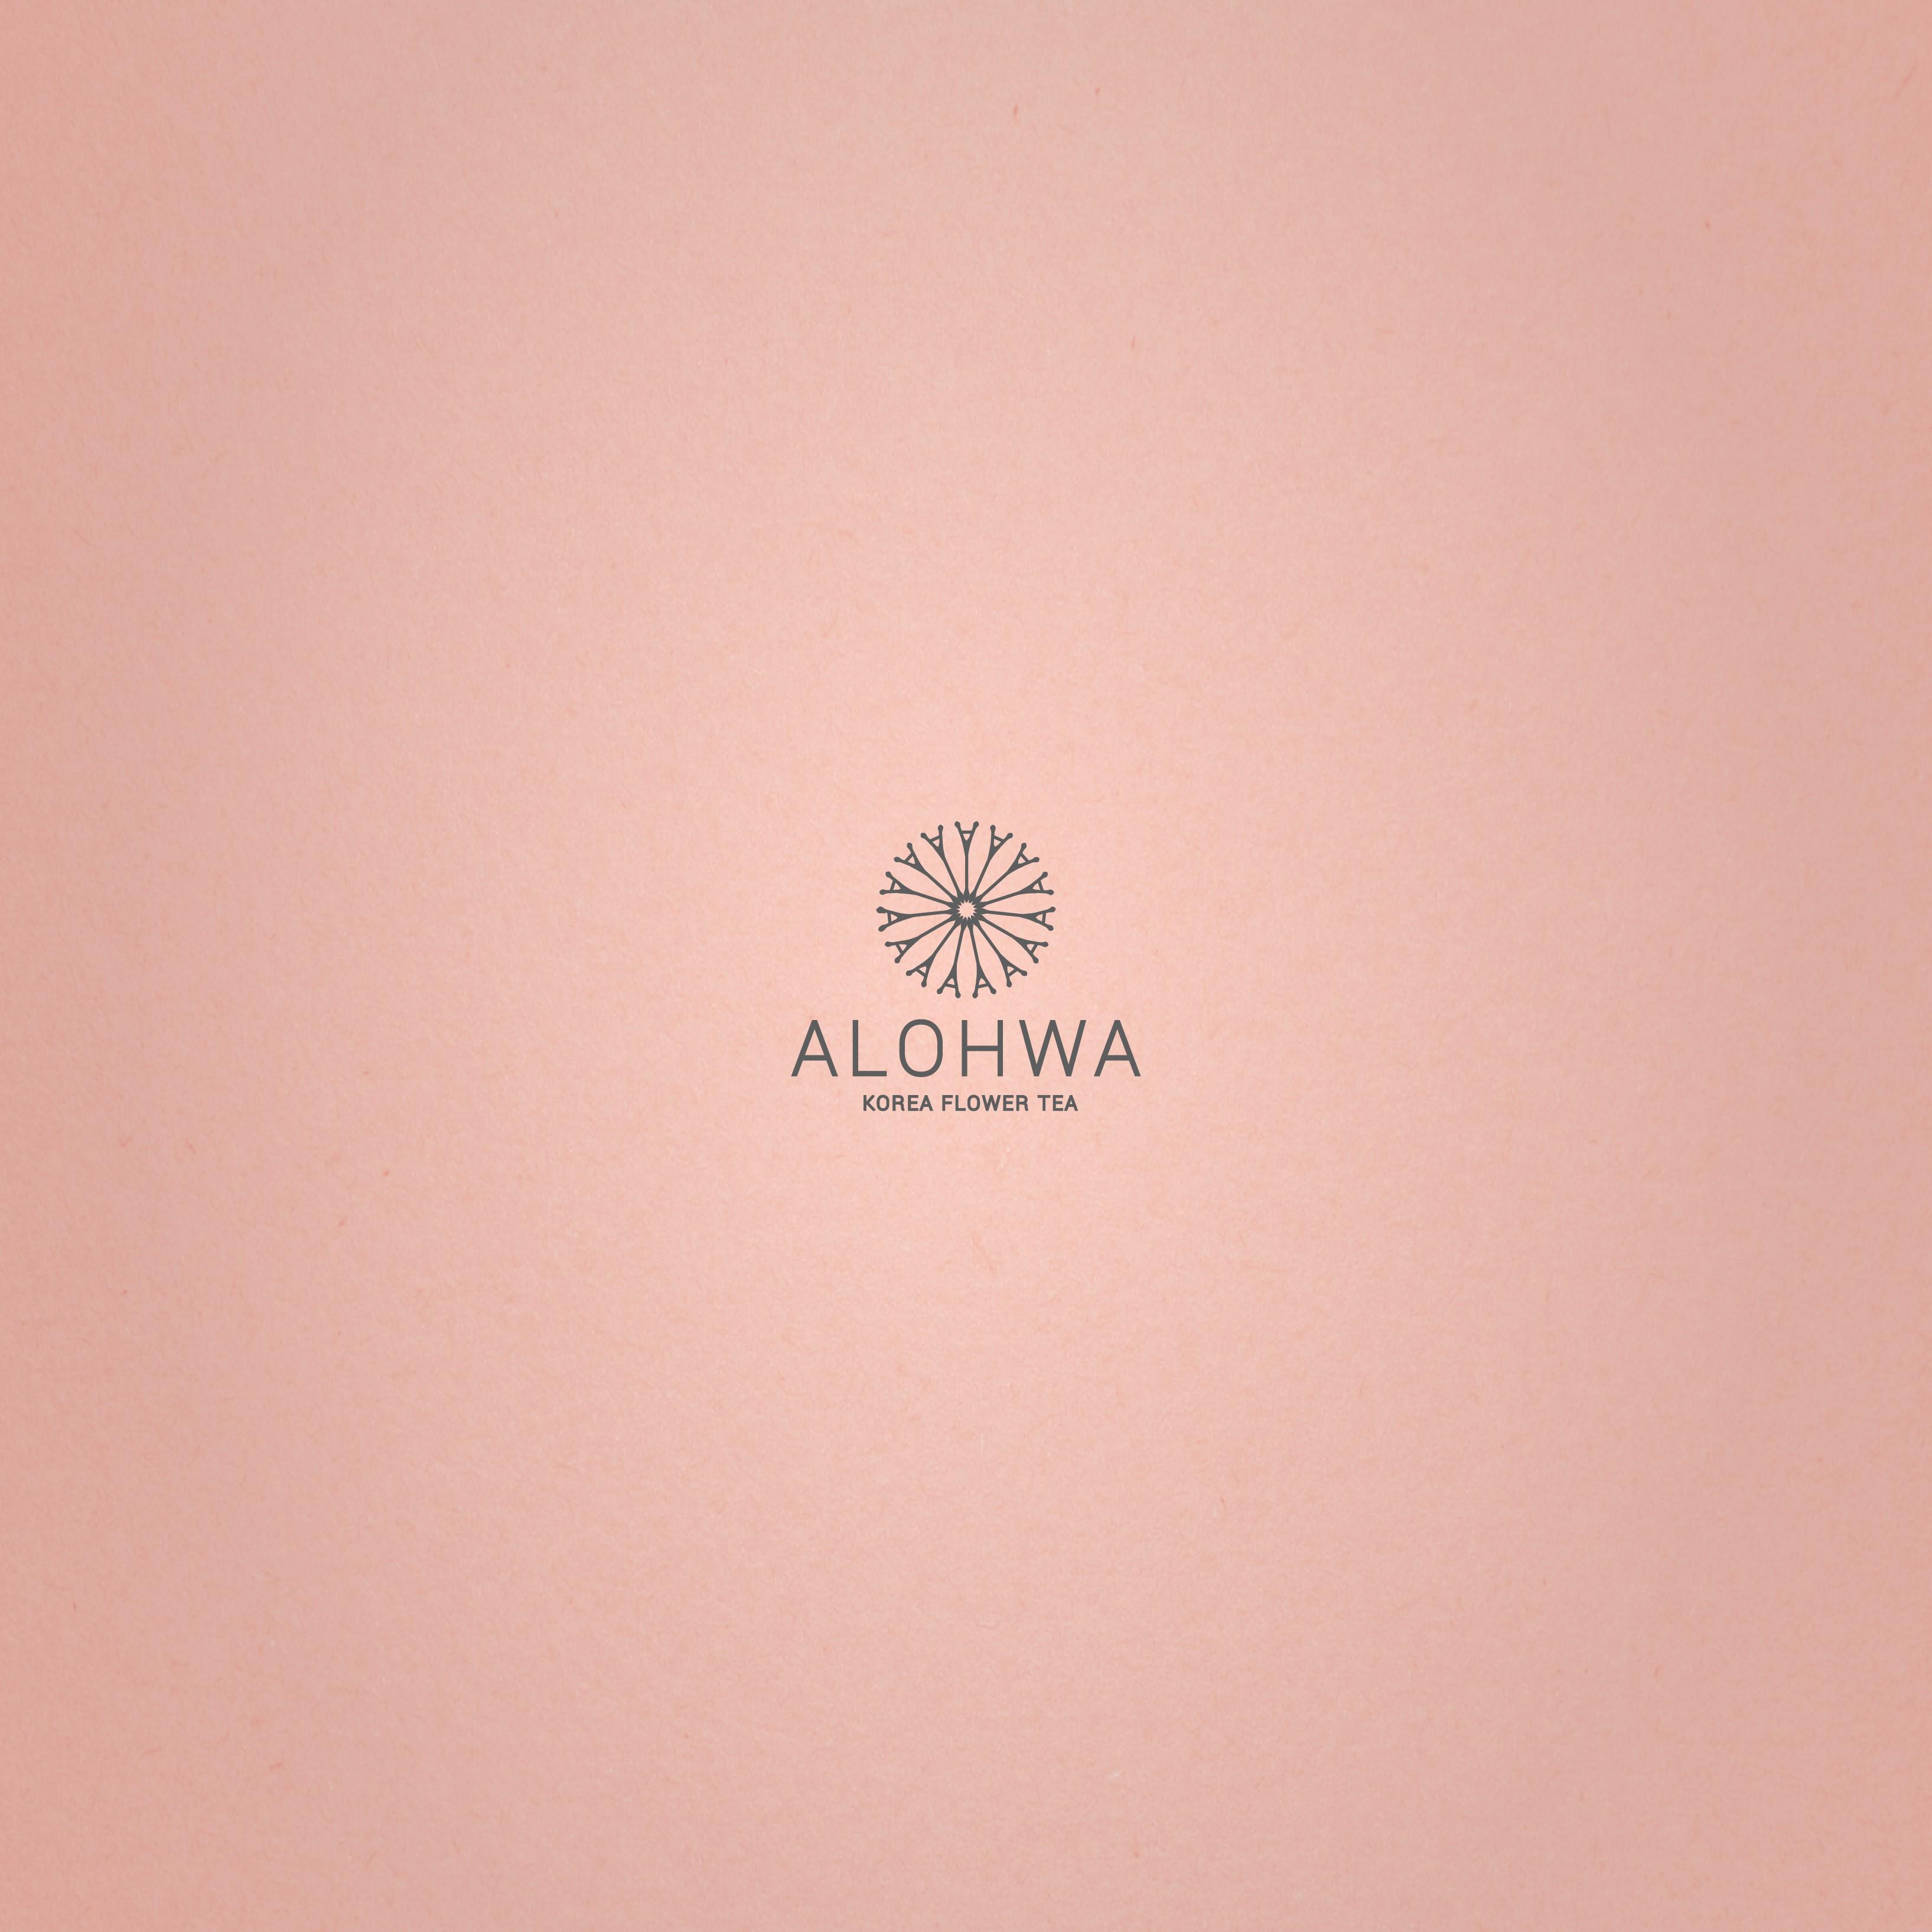 Alohwa_160421_785pix__귗뀫_€_뚡뀫__02.jpg